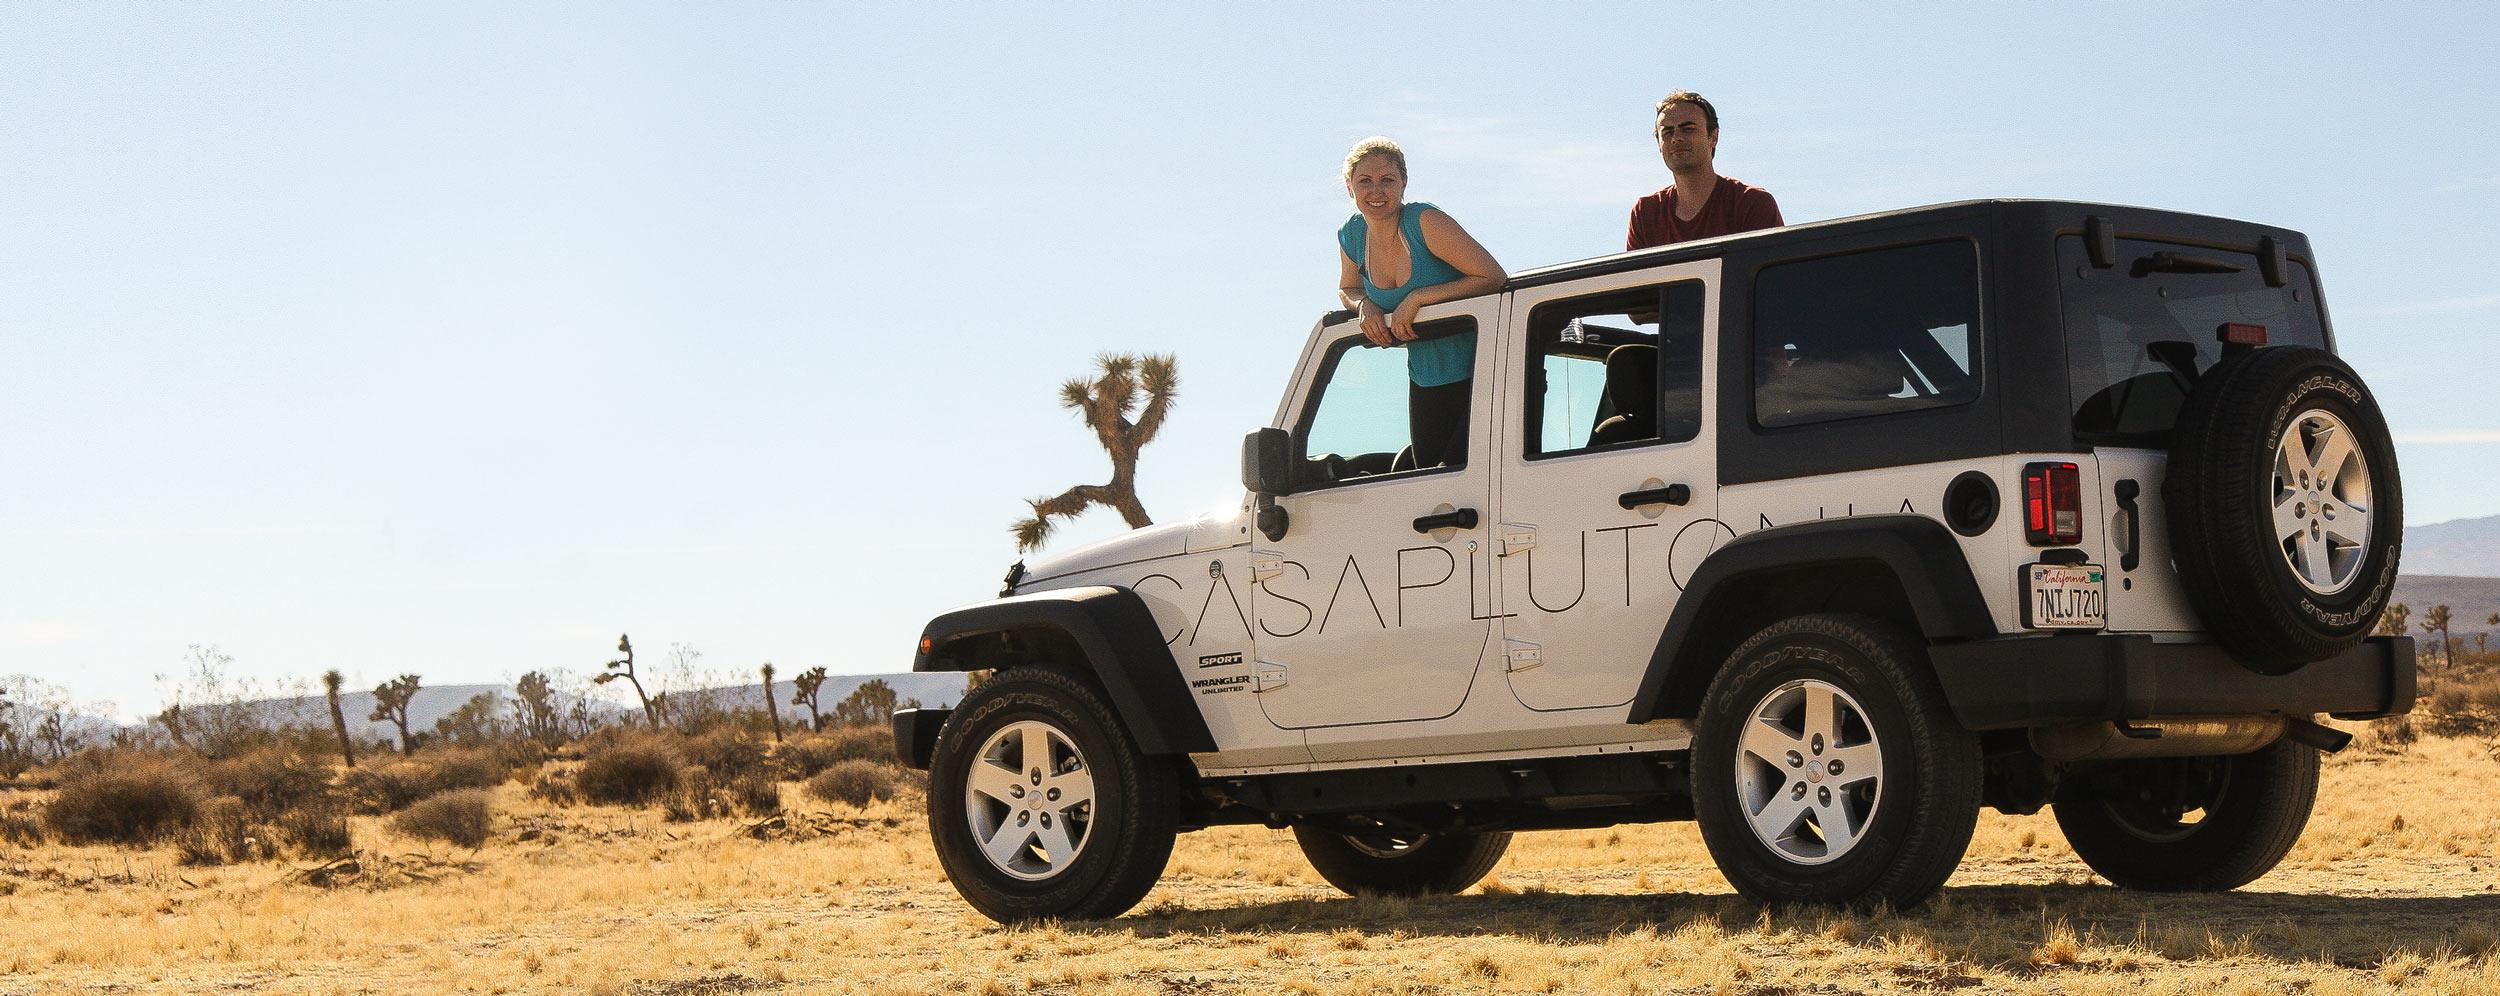 adventure-tour-casaplutonia.jpg